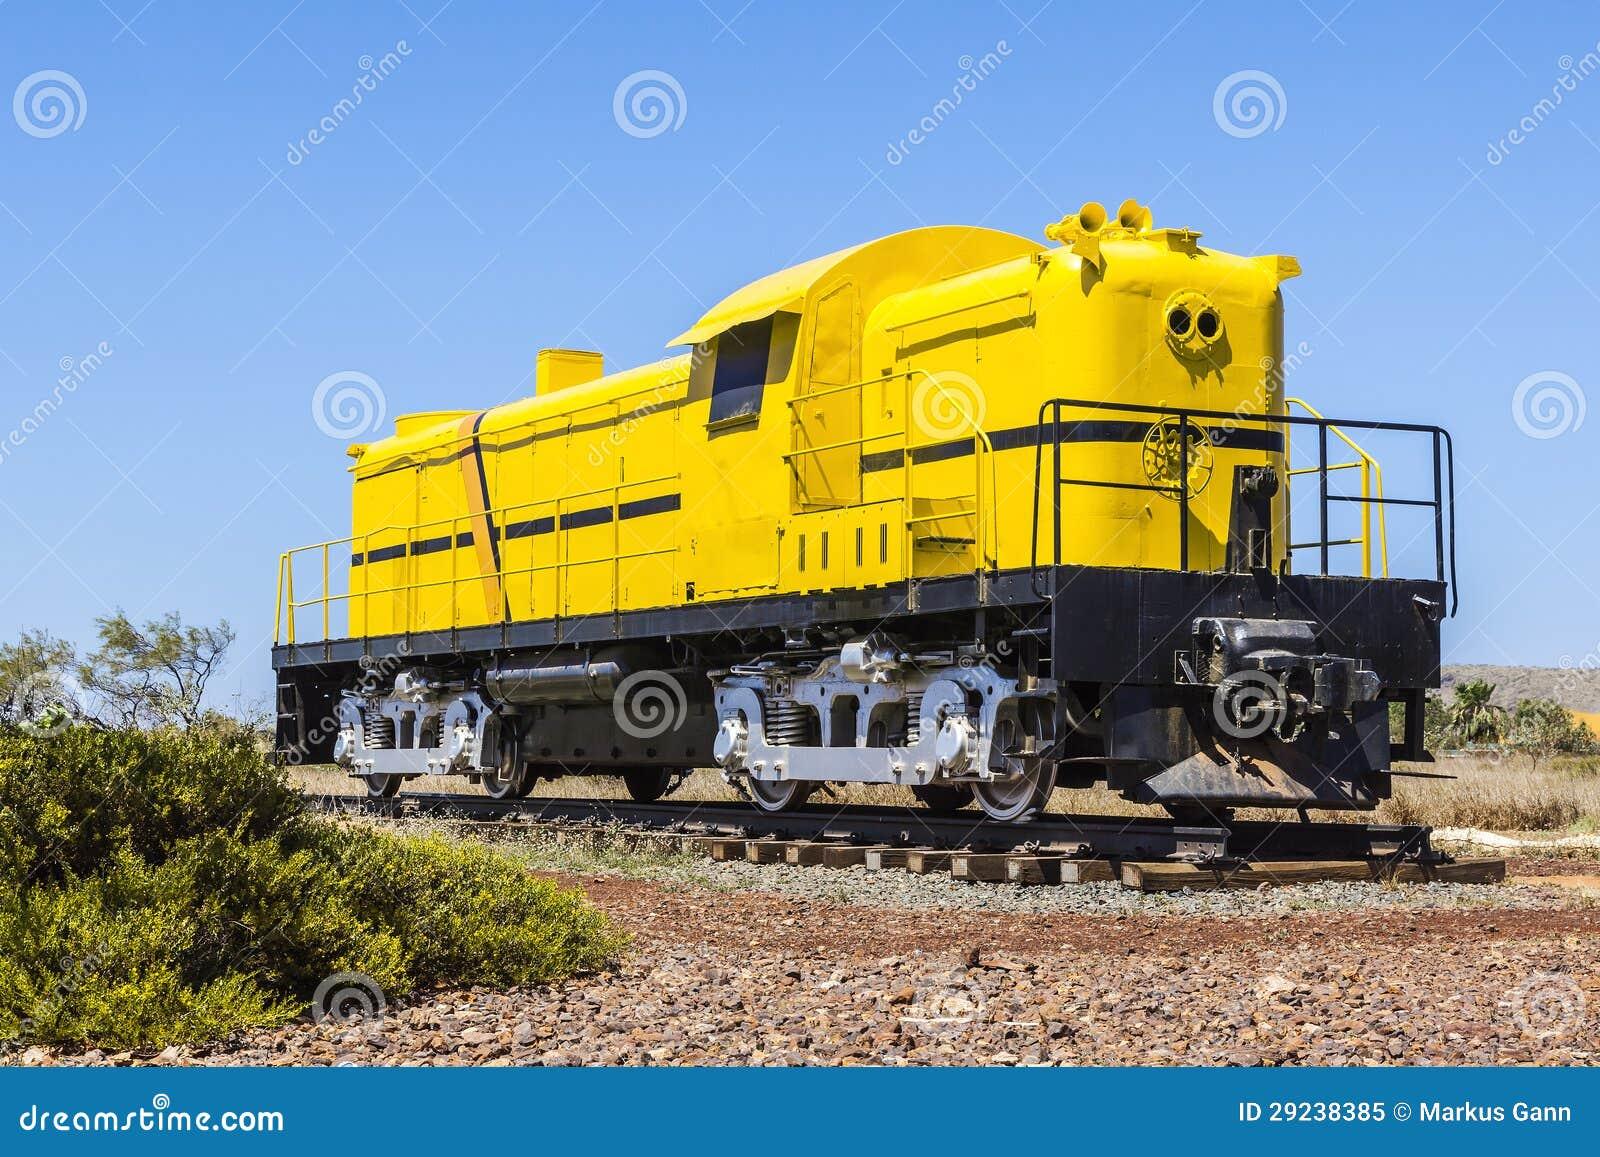 Download Trem amarelo imagem de stock. Imagem de industrial, closed - 29238385